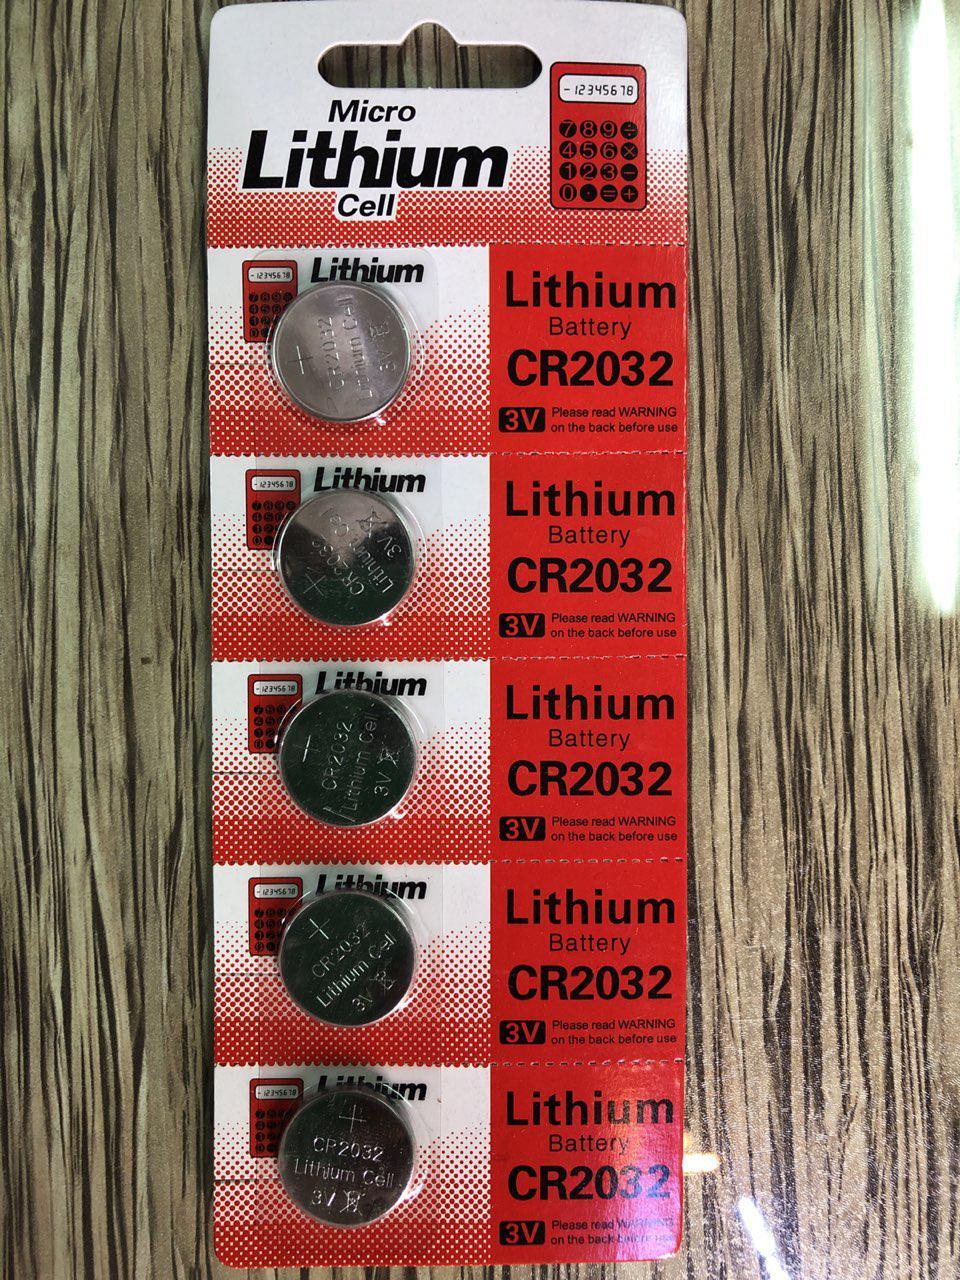 lithium cell battery cr2032 lithium cell battery cr2032 Lithium Cell Battery CR2032 Lithium Cell Battery CR2032